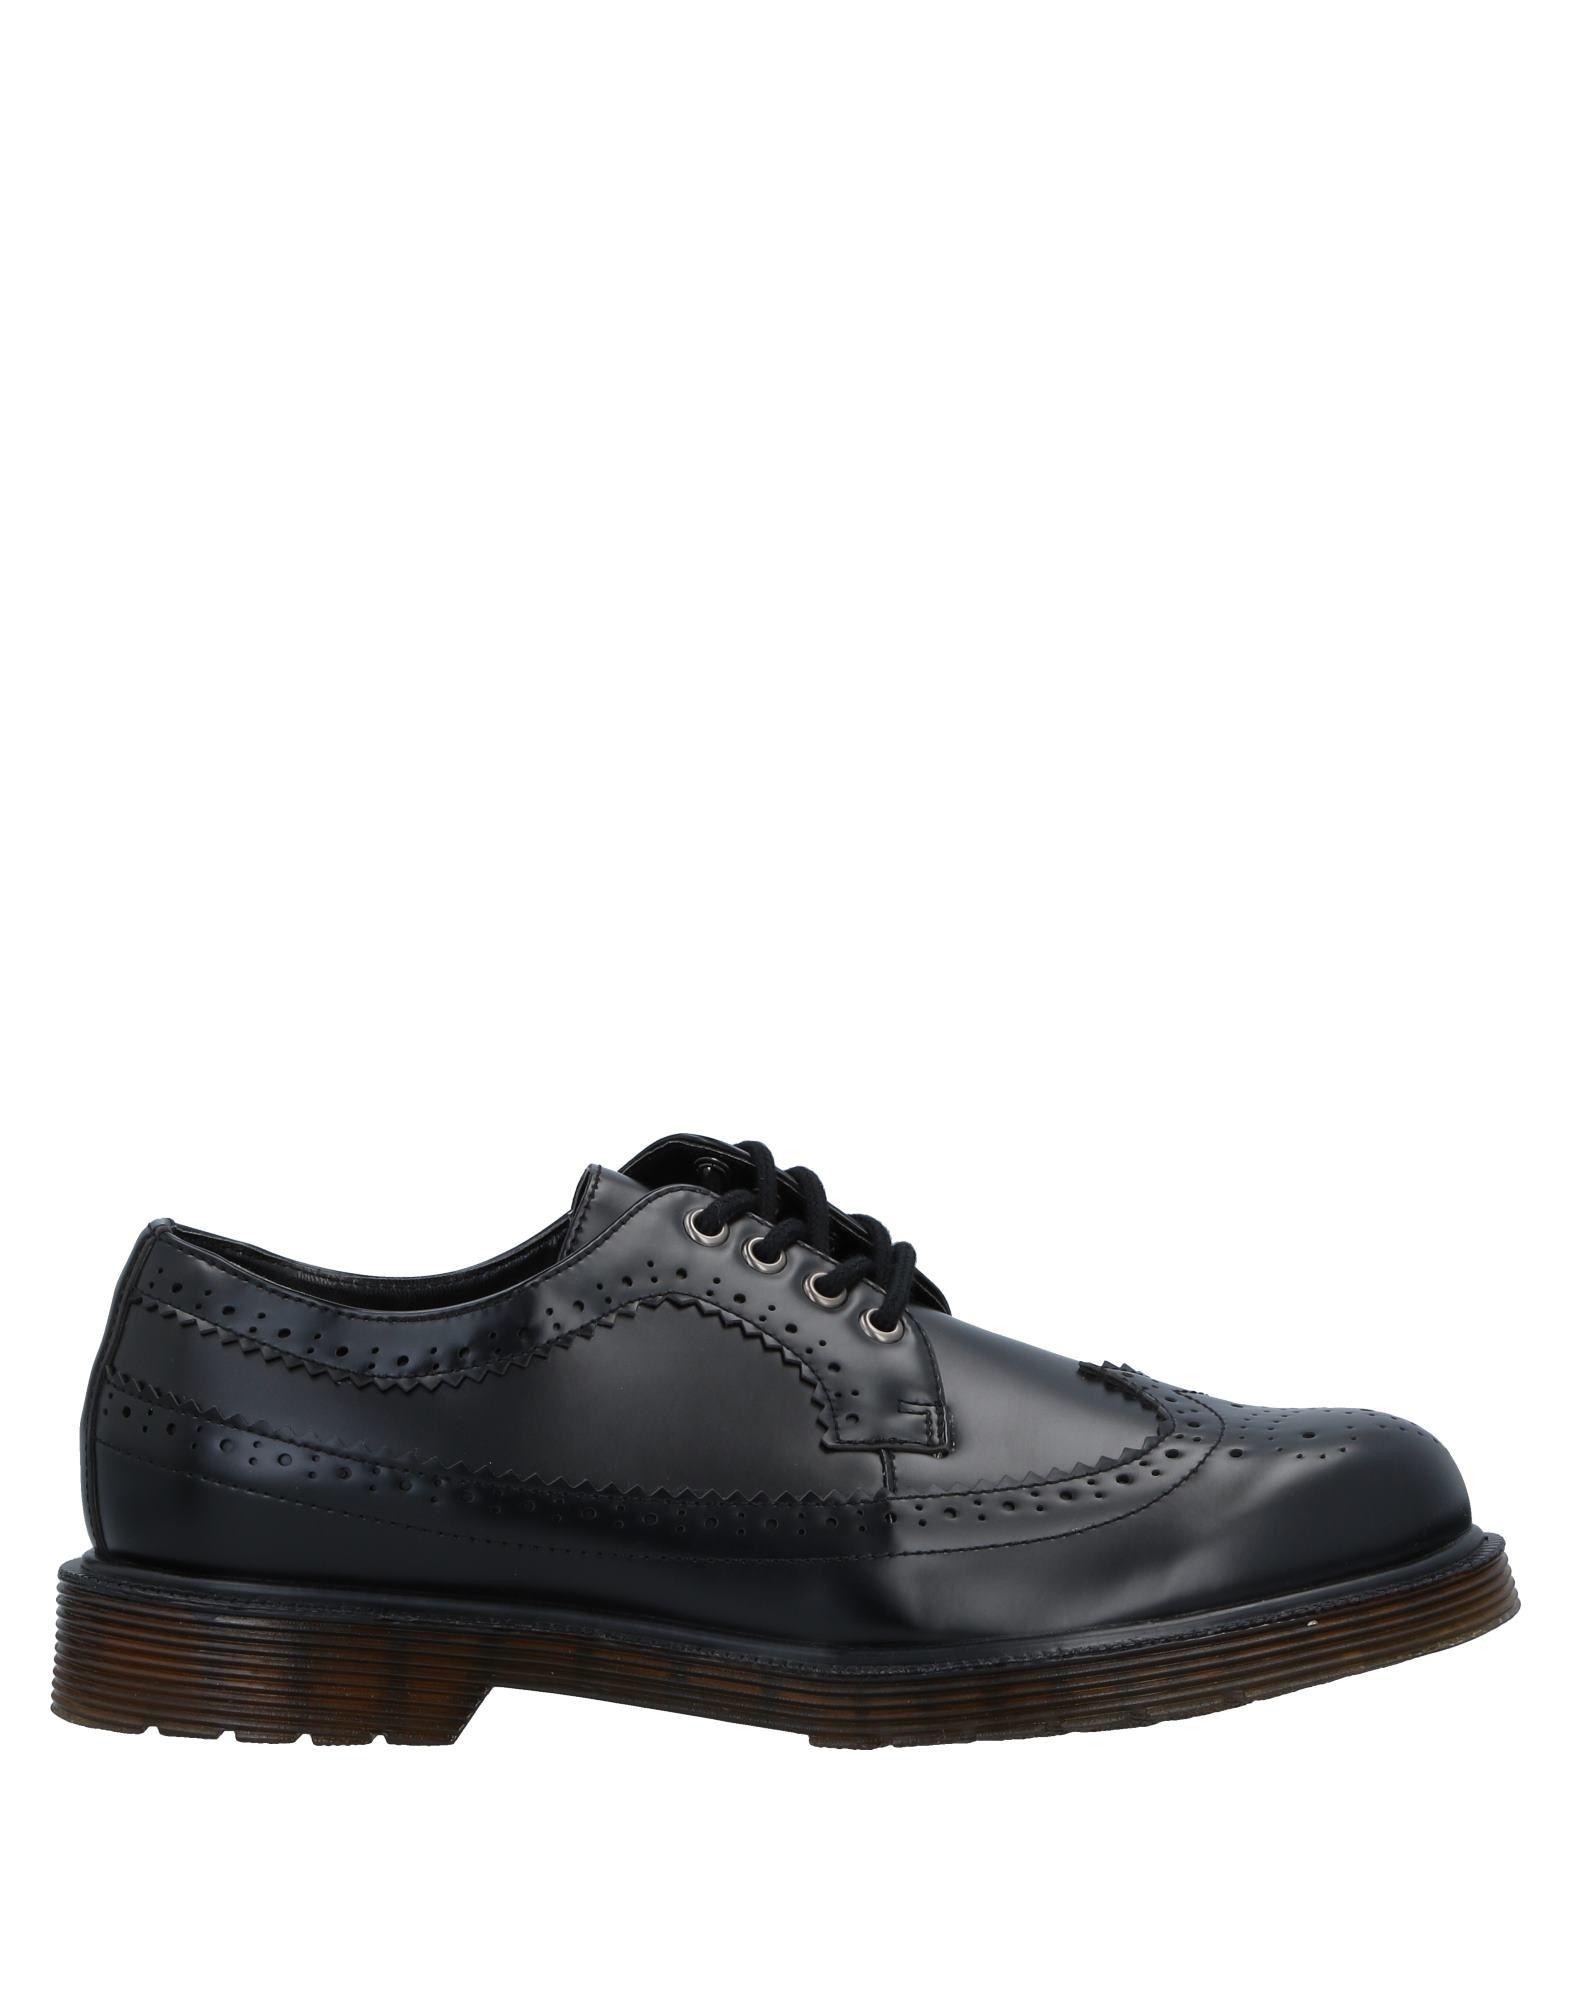 Фото - RIFLE Обувь на шнурках обувь на высокой платформе dkny